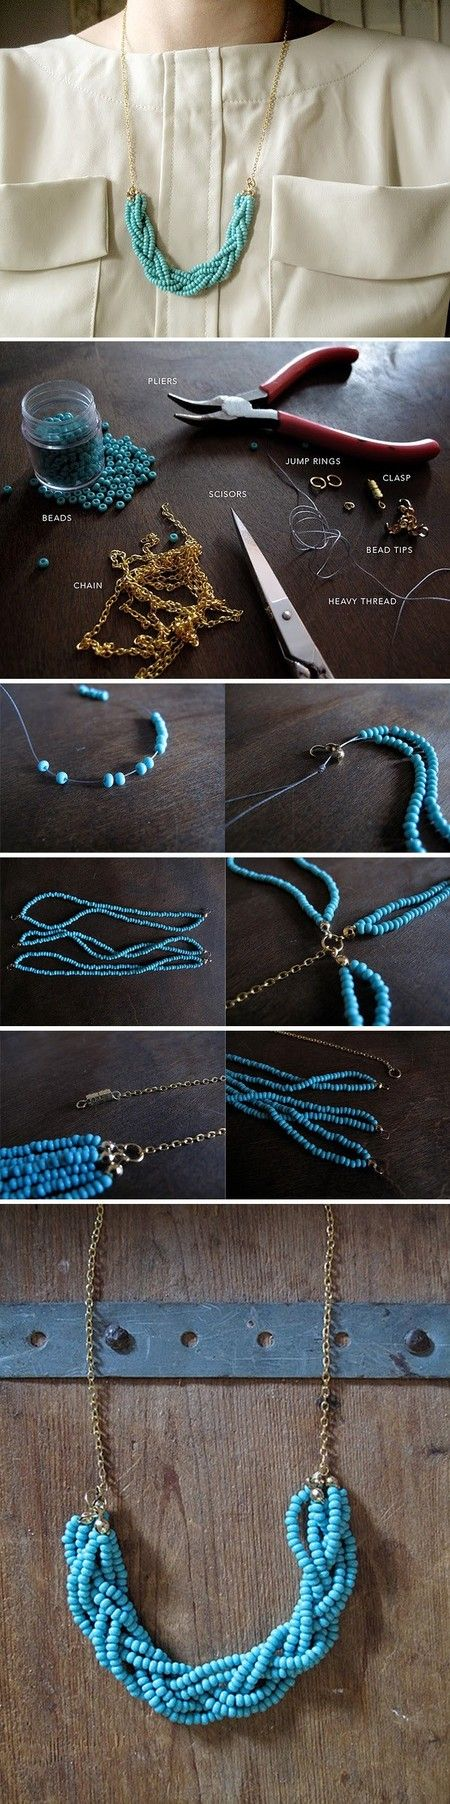 Braided bead Necklace DIY